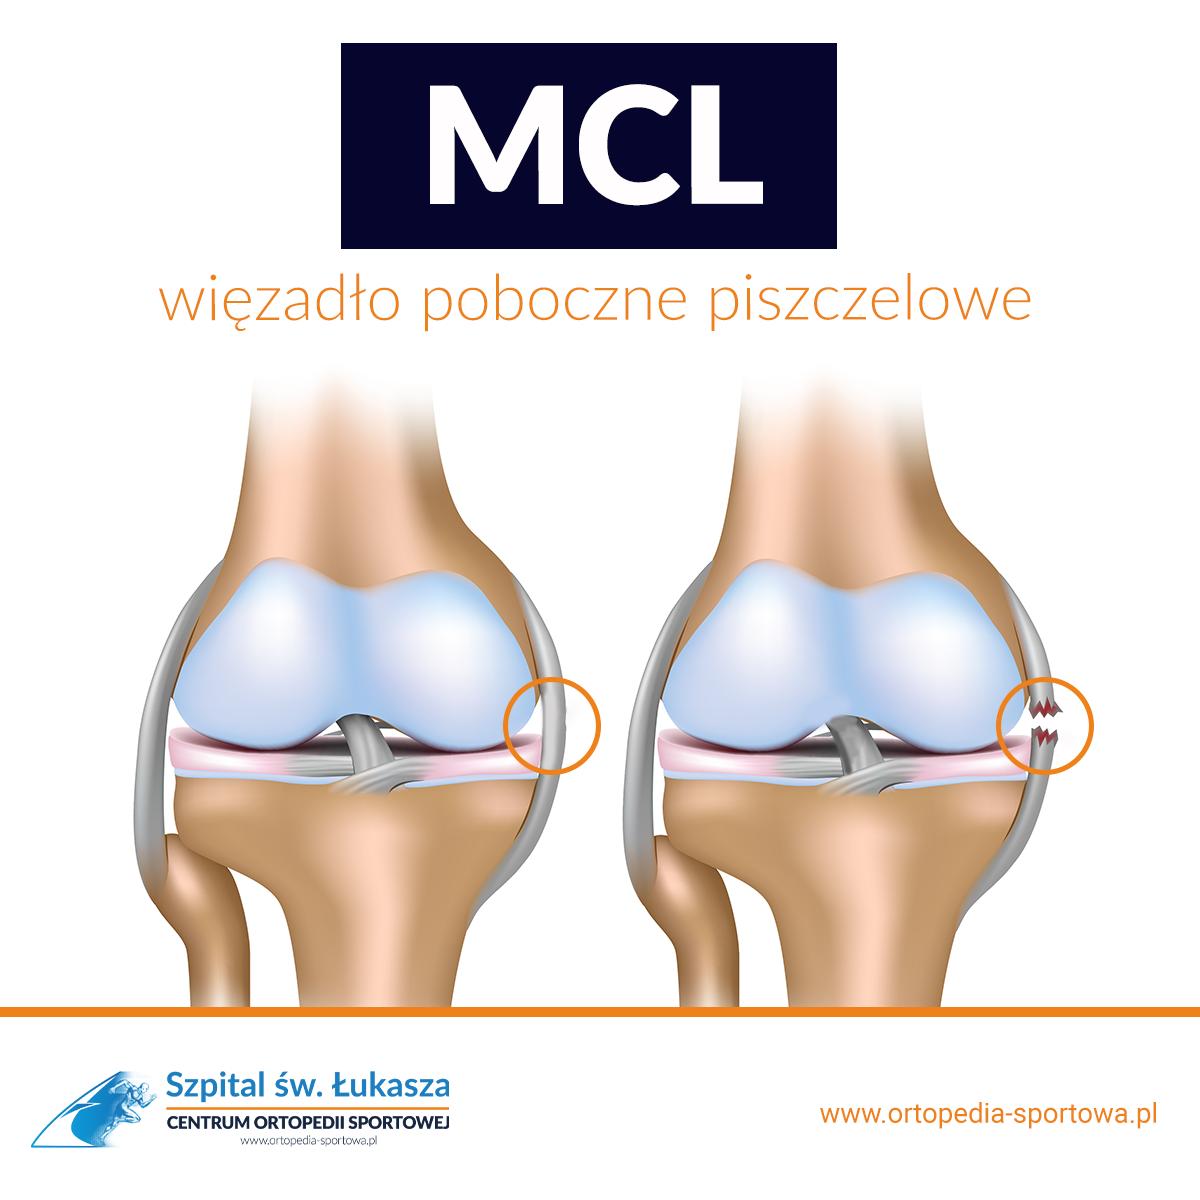 MCL wi臋zad艂o ortopedia piszczelowe